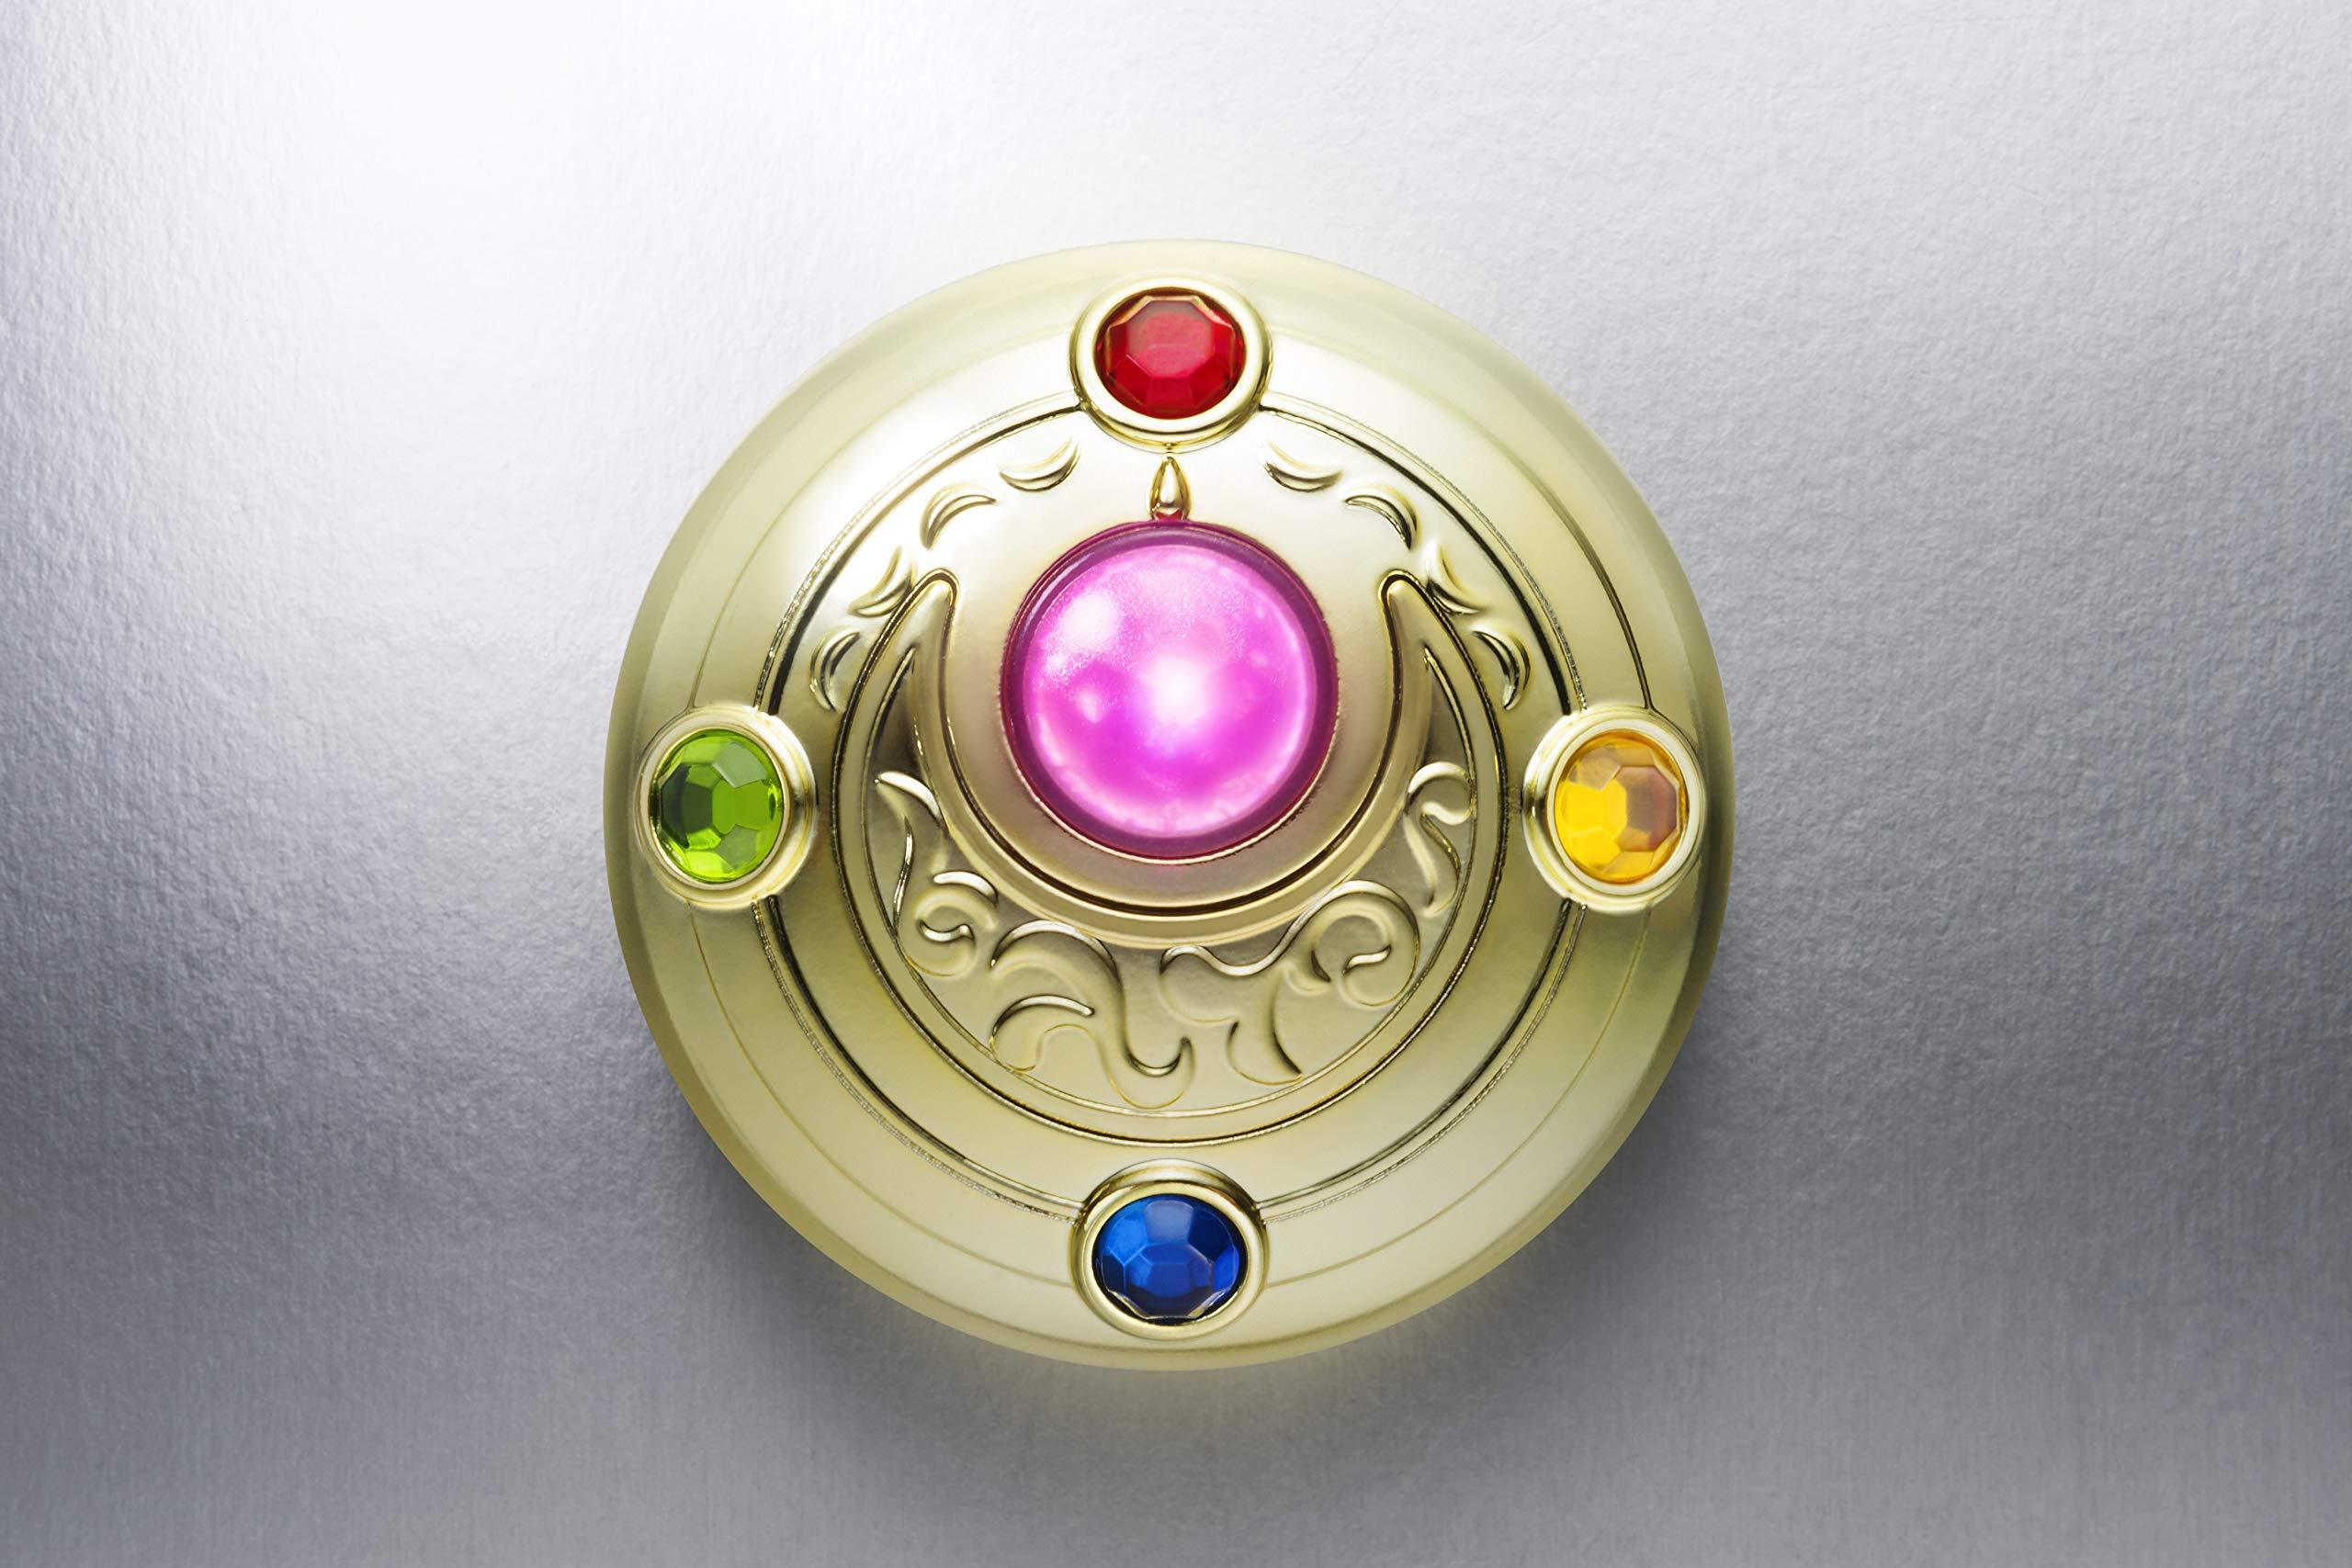 Bandai Tamashii Nations Proplica Transformation Brooch & Disguise Pen Set ''Sailor Moon'' Statue by Tamashii Nations (Image #8)